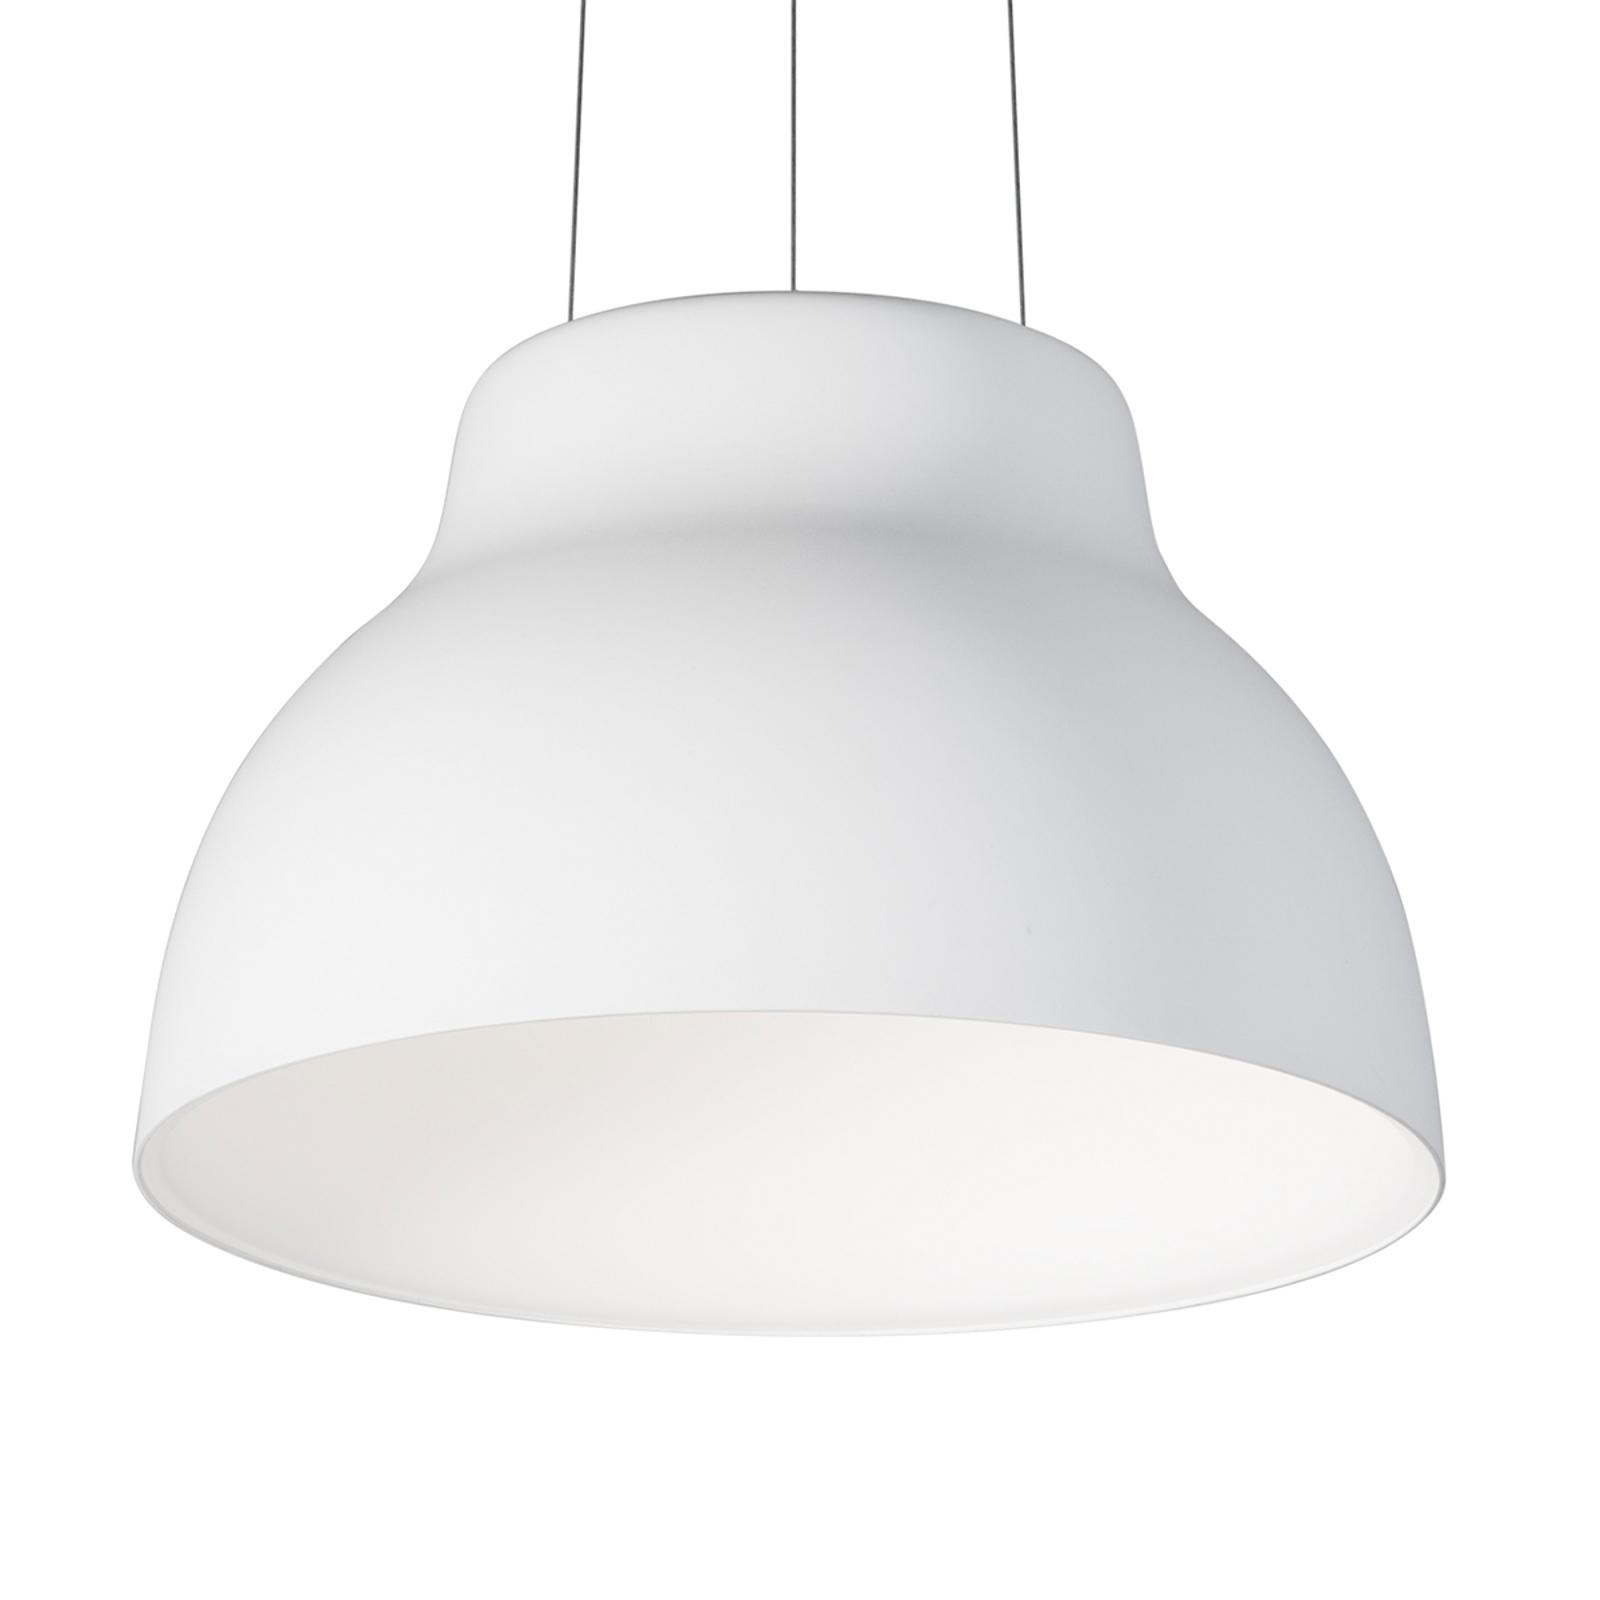 Martinelli Luce Cicala -LED-riippuvalaisin